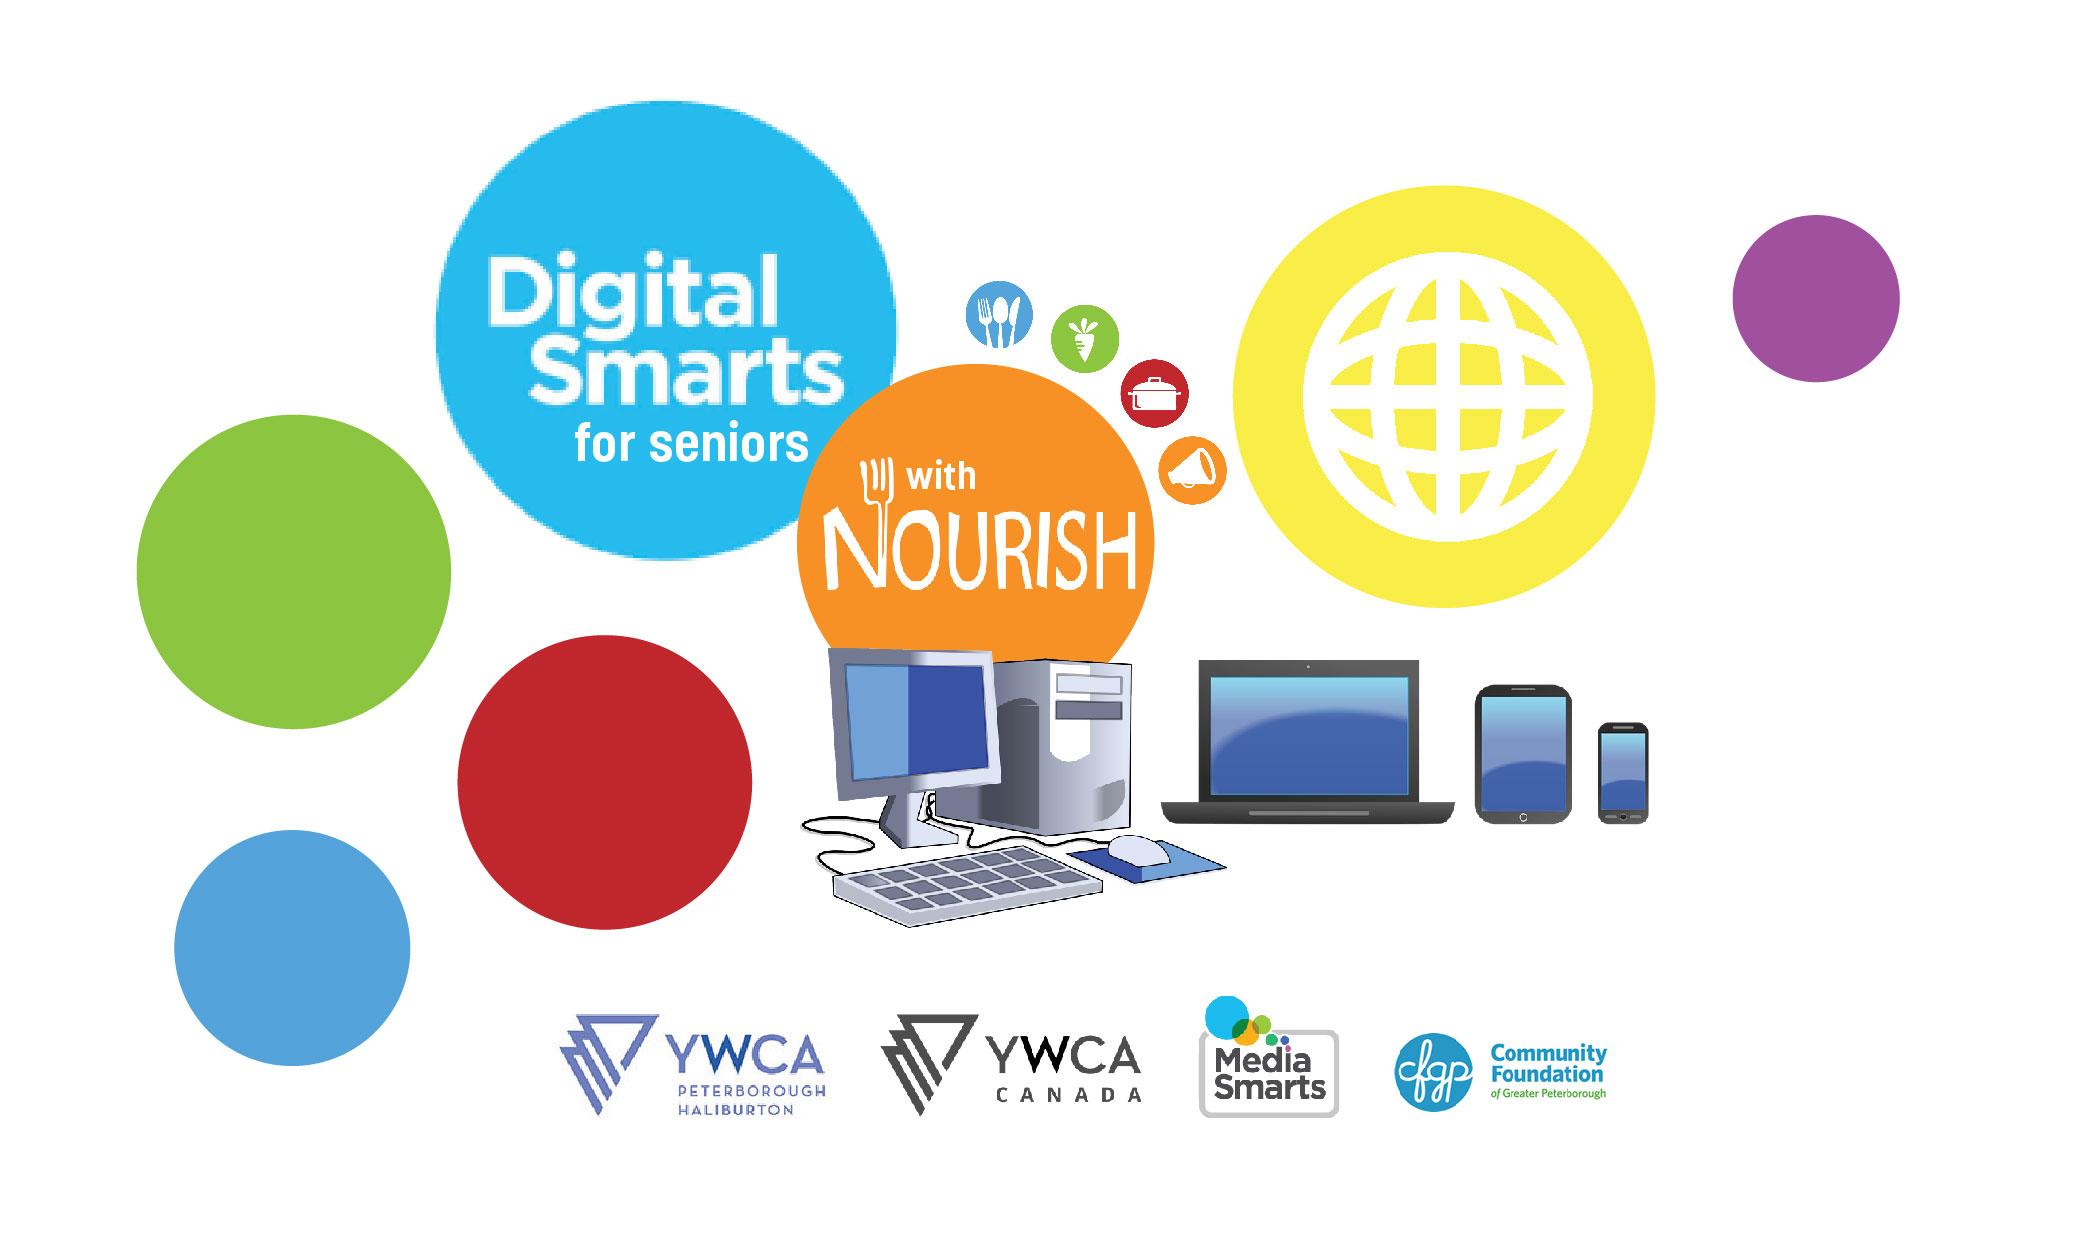 Digital Smarts for Seniors